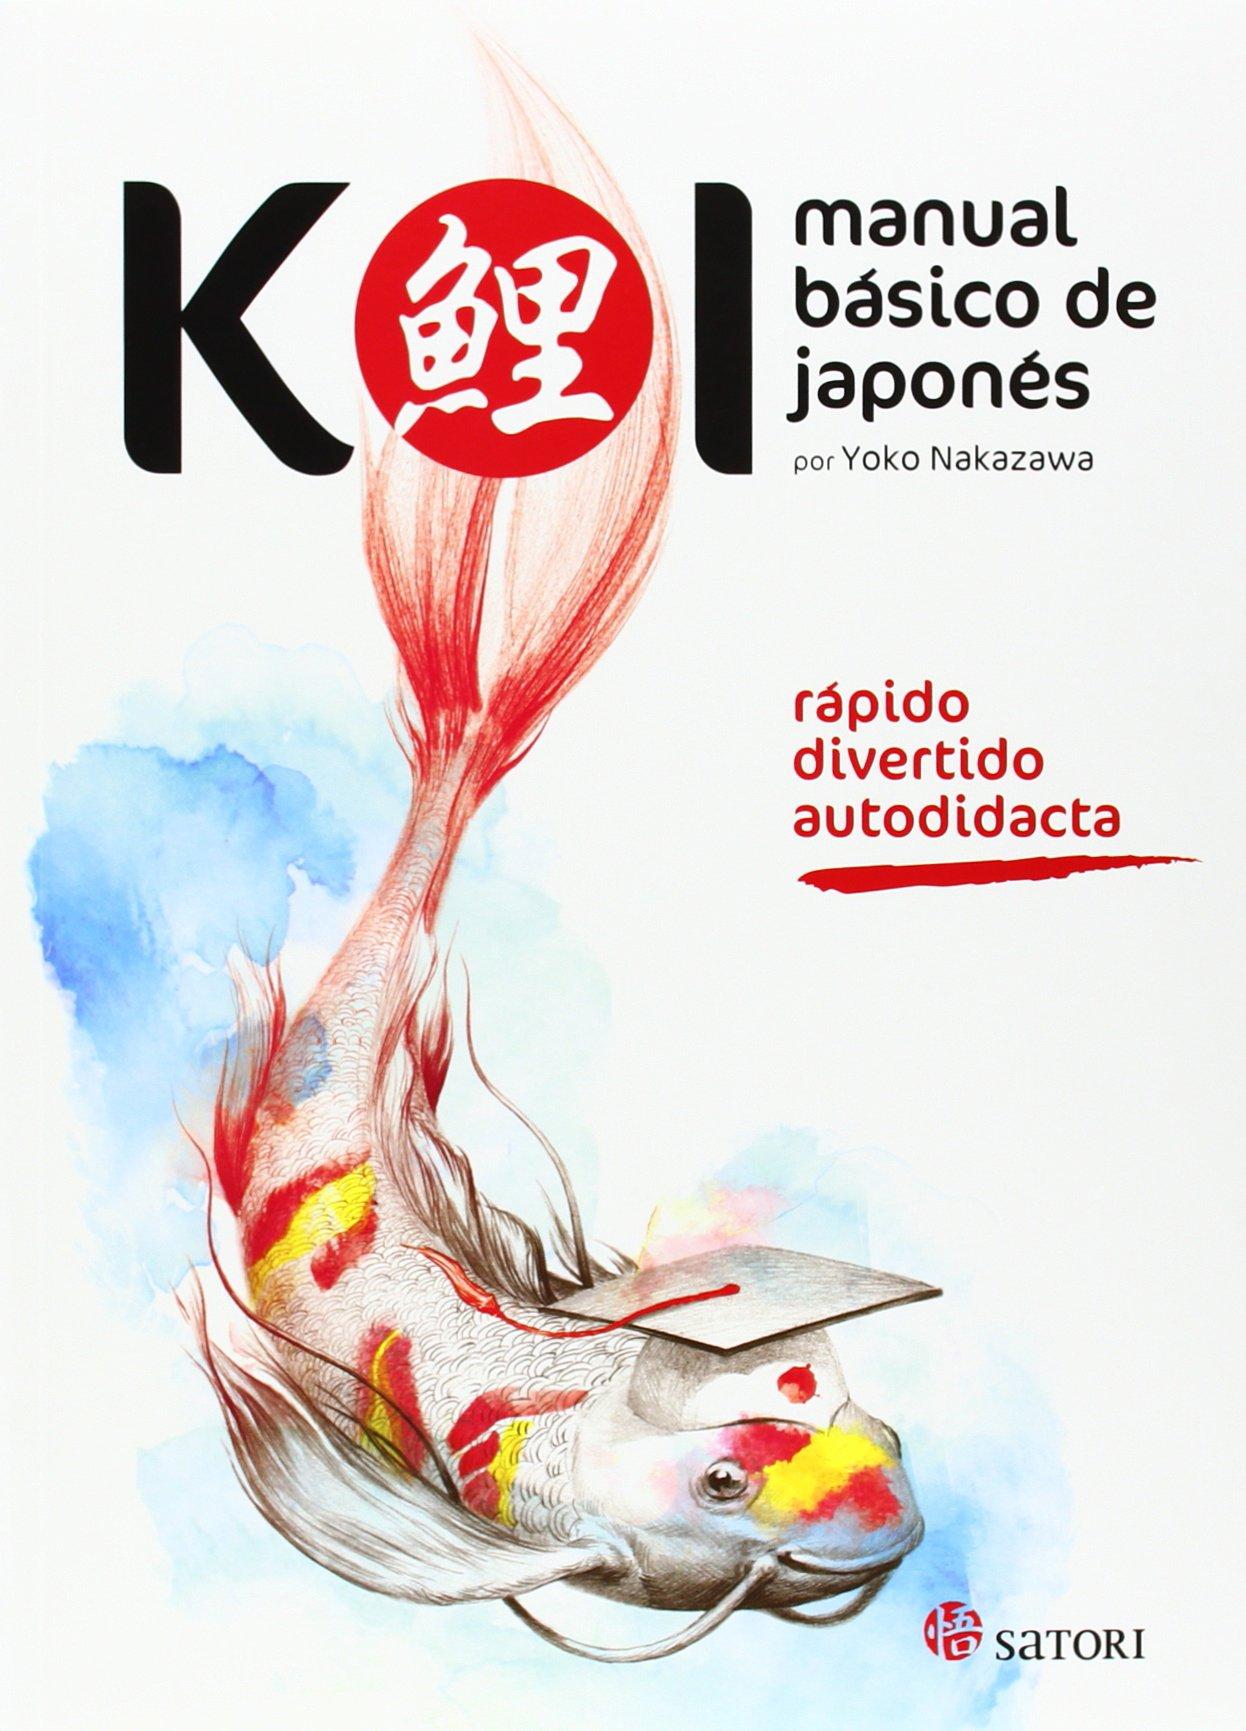 Koi. Manual básico de japonés (Idioma) Tapa blanda – 8 sep 2014 Yoko Nakazawa SATORI EDICIONES 8494239015 Japan